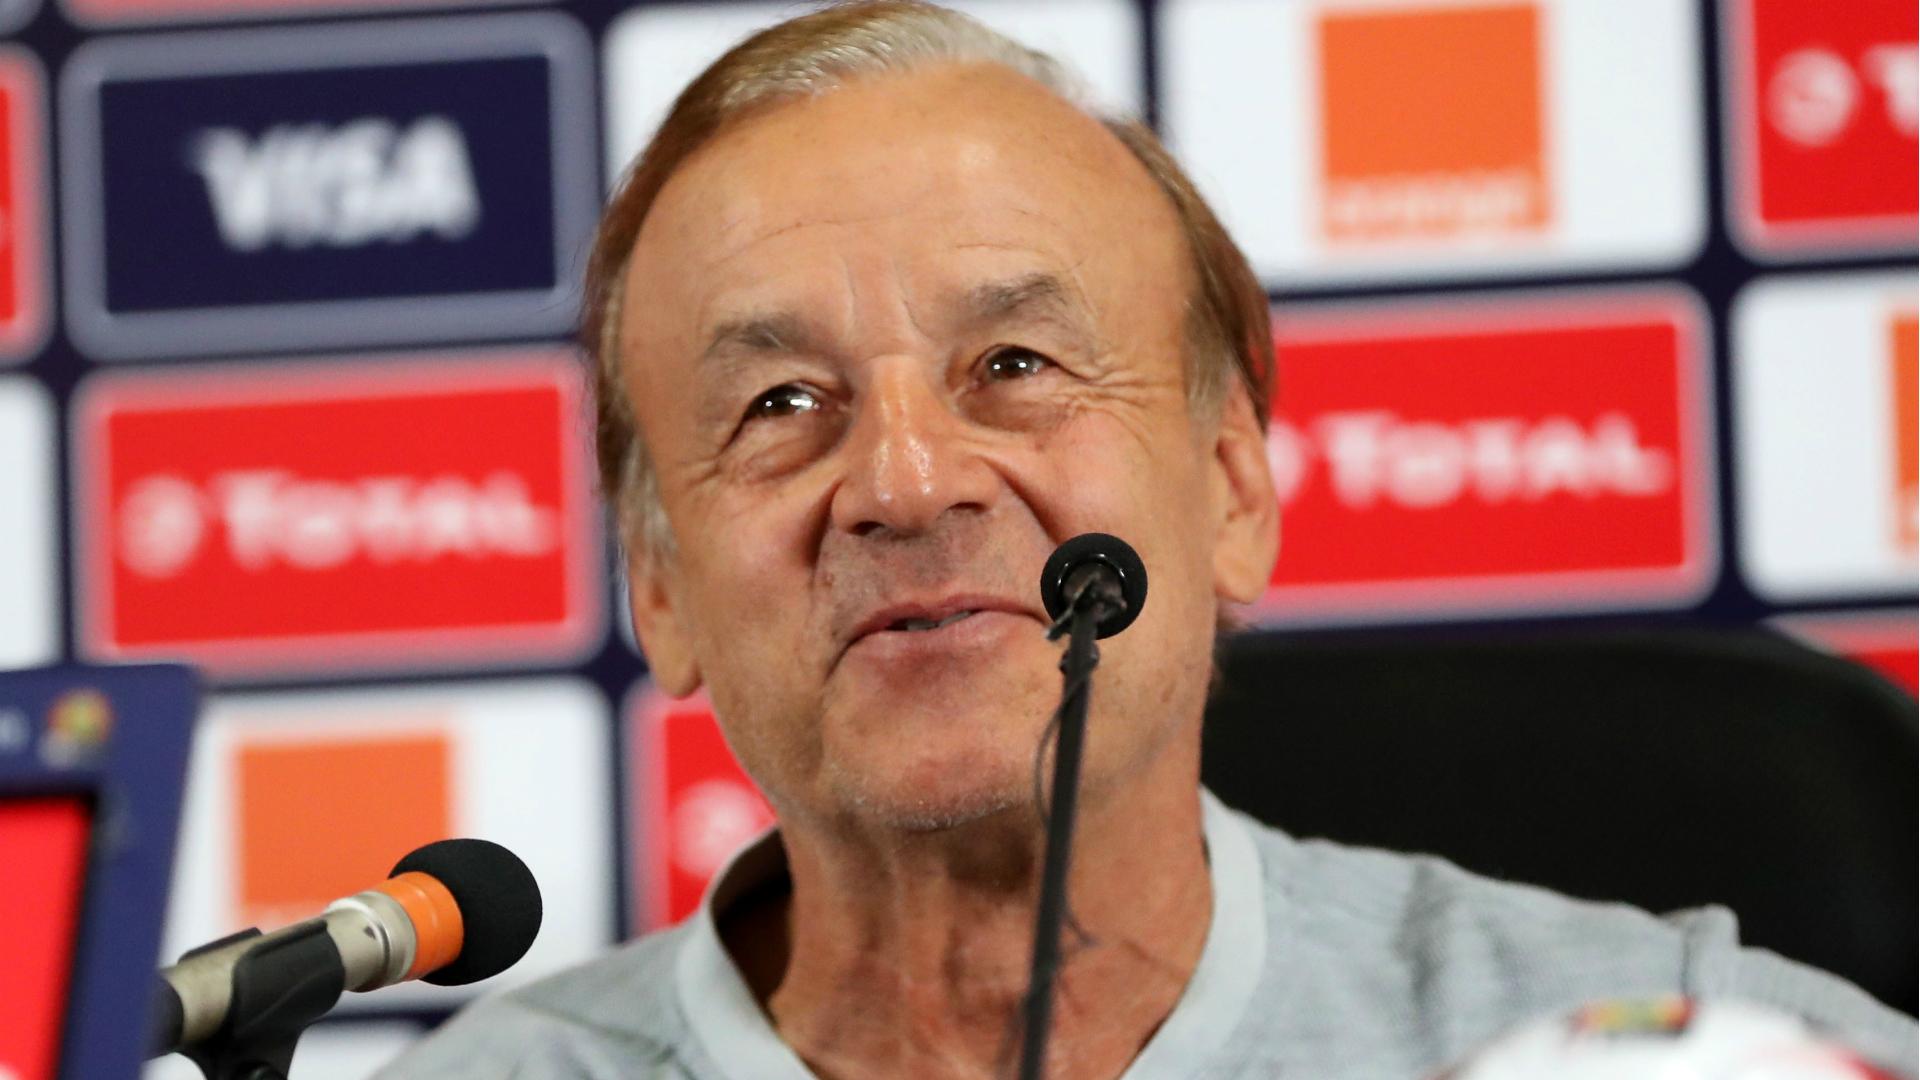 Rohr anticipates Nigeria selection headache ahead of Sierra Leone clash